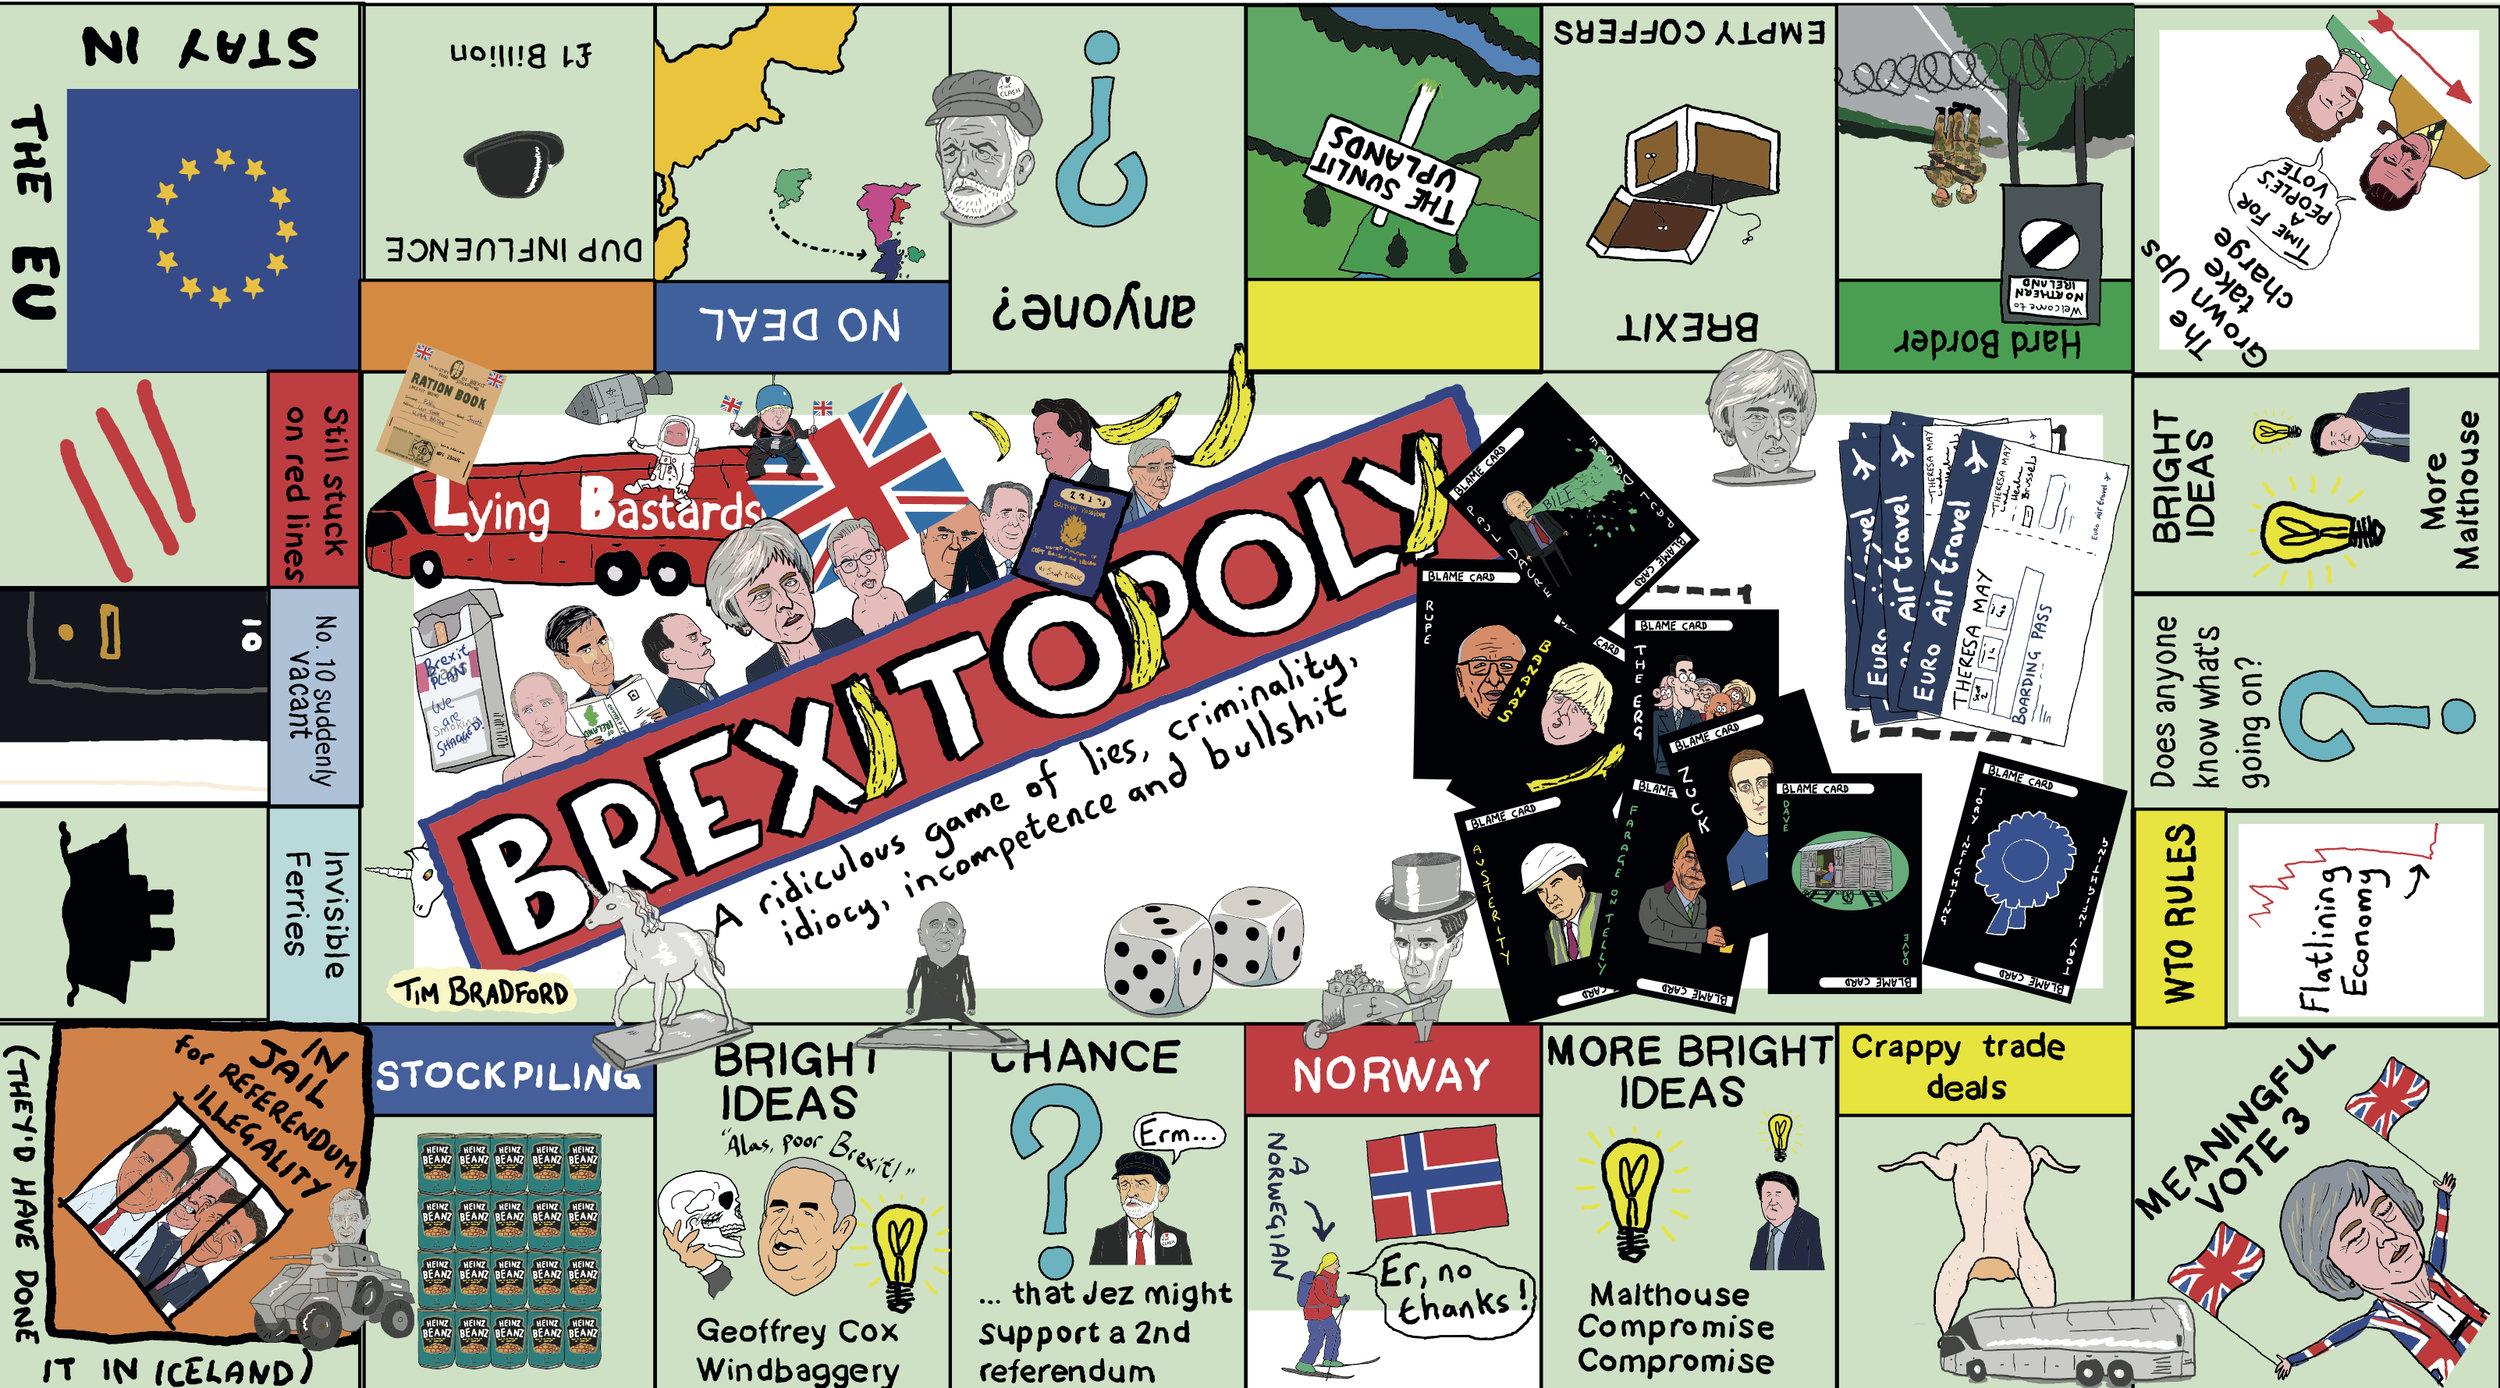 Brexitopoly - 11/03/2019